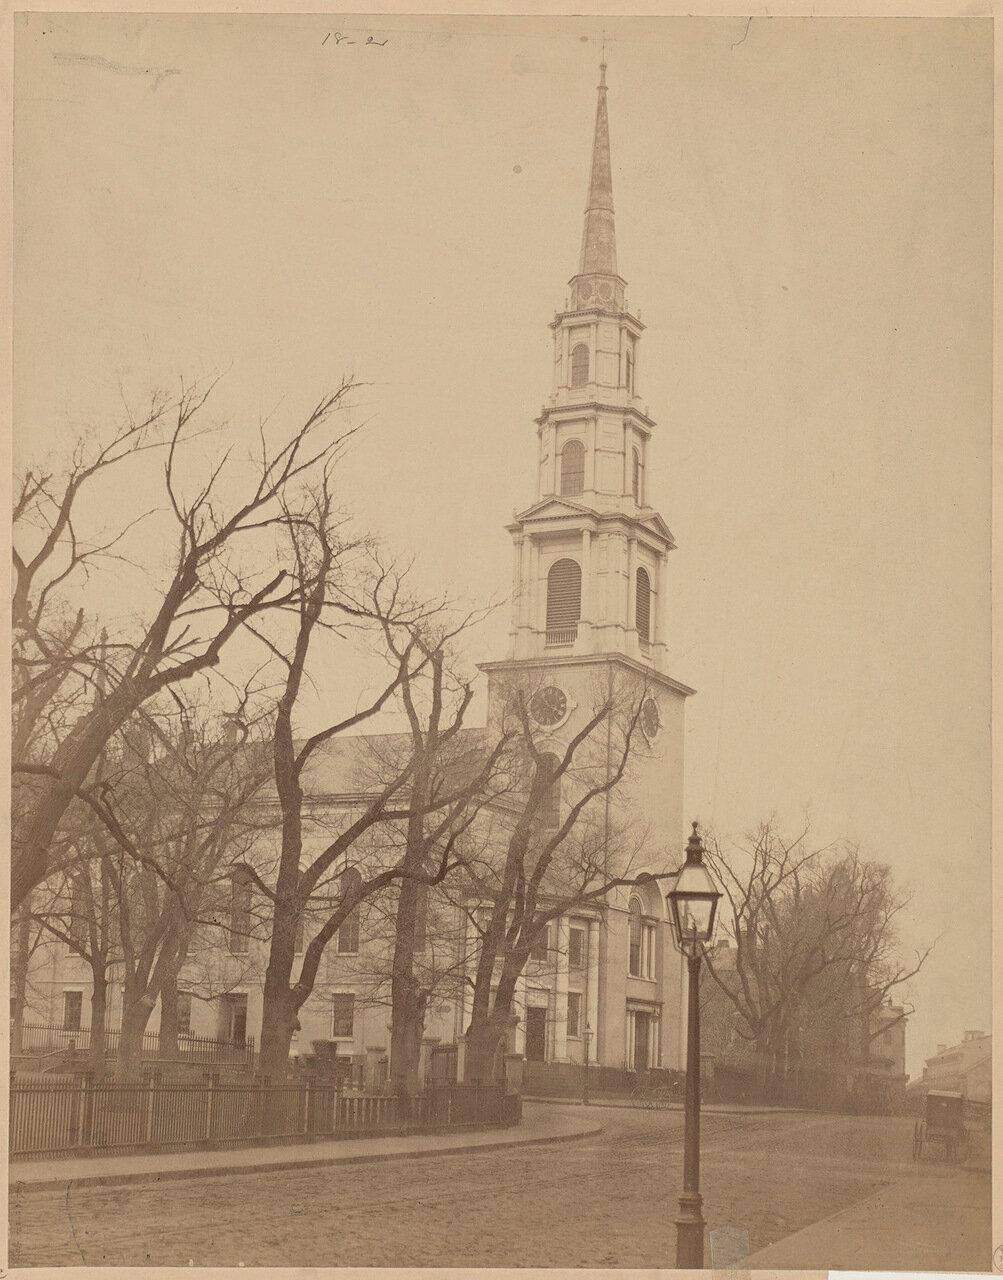 1855 - 1870